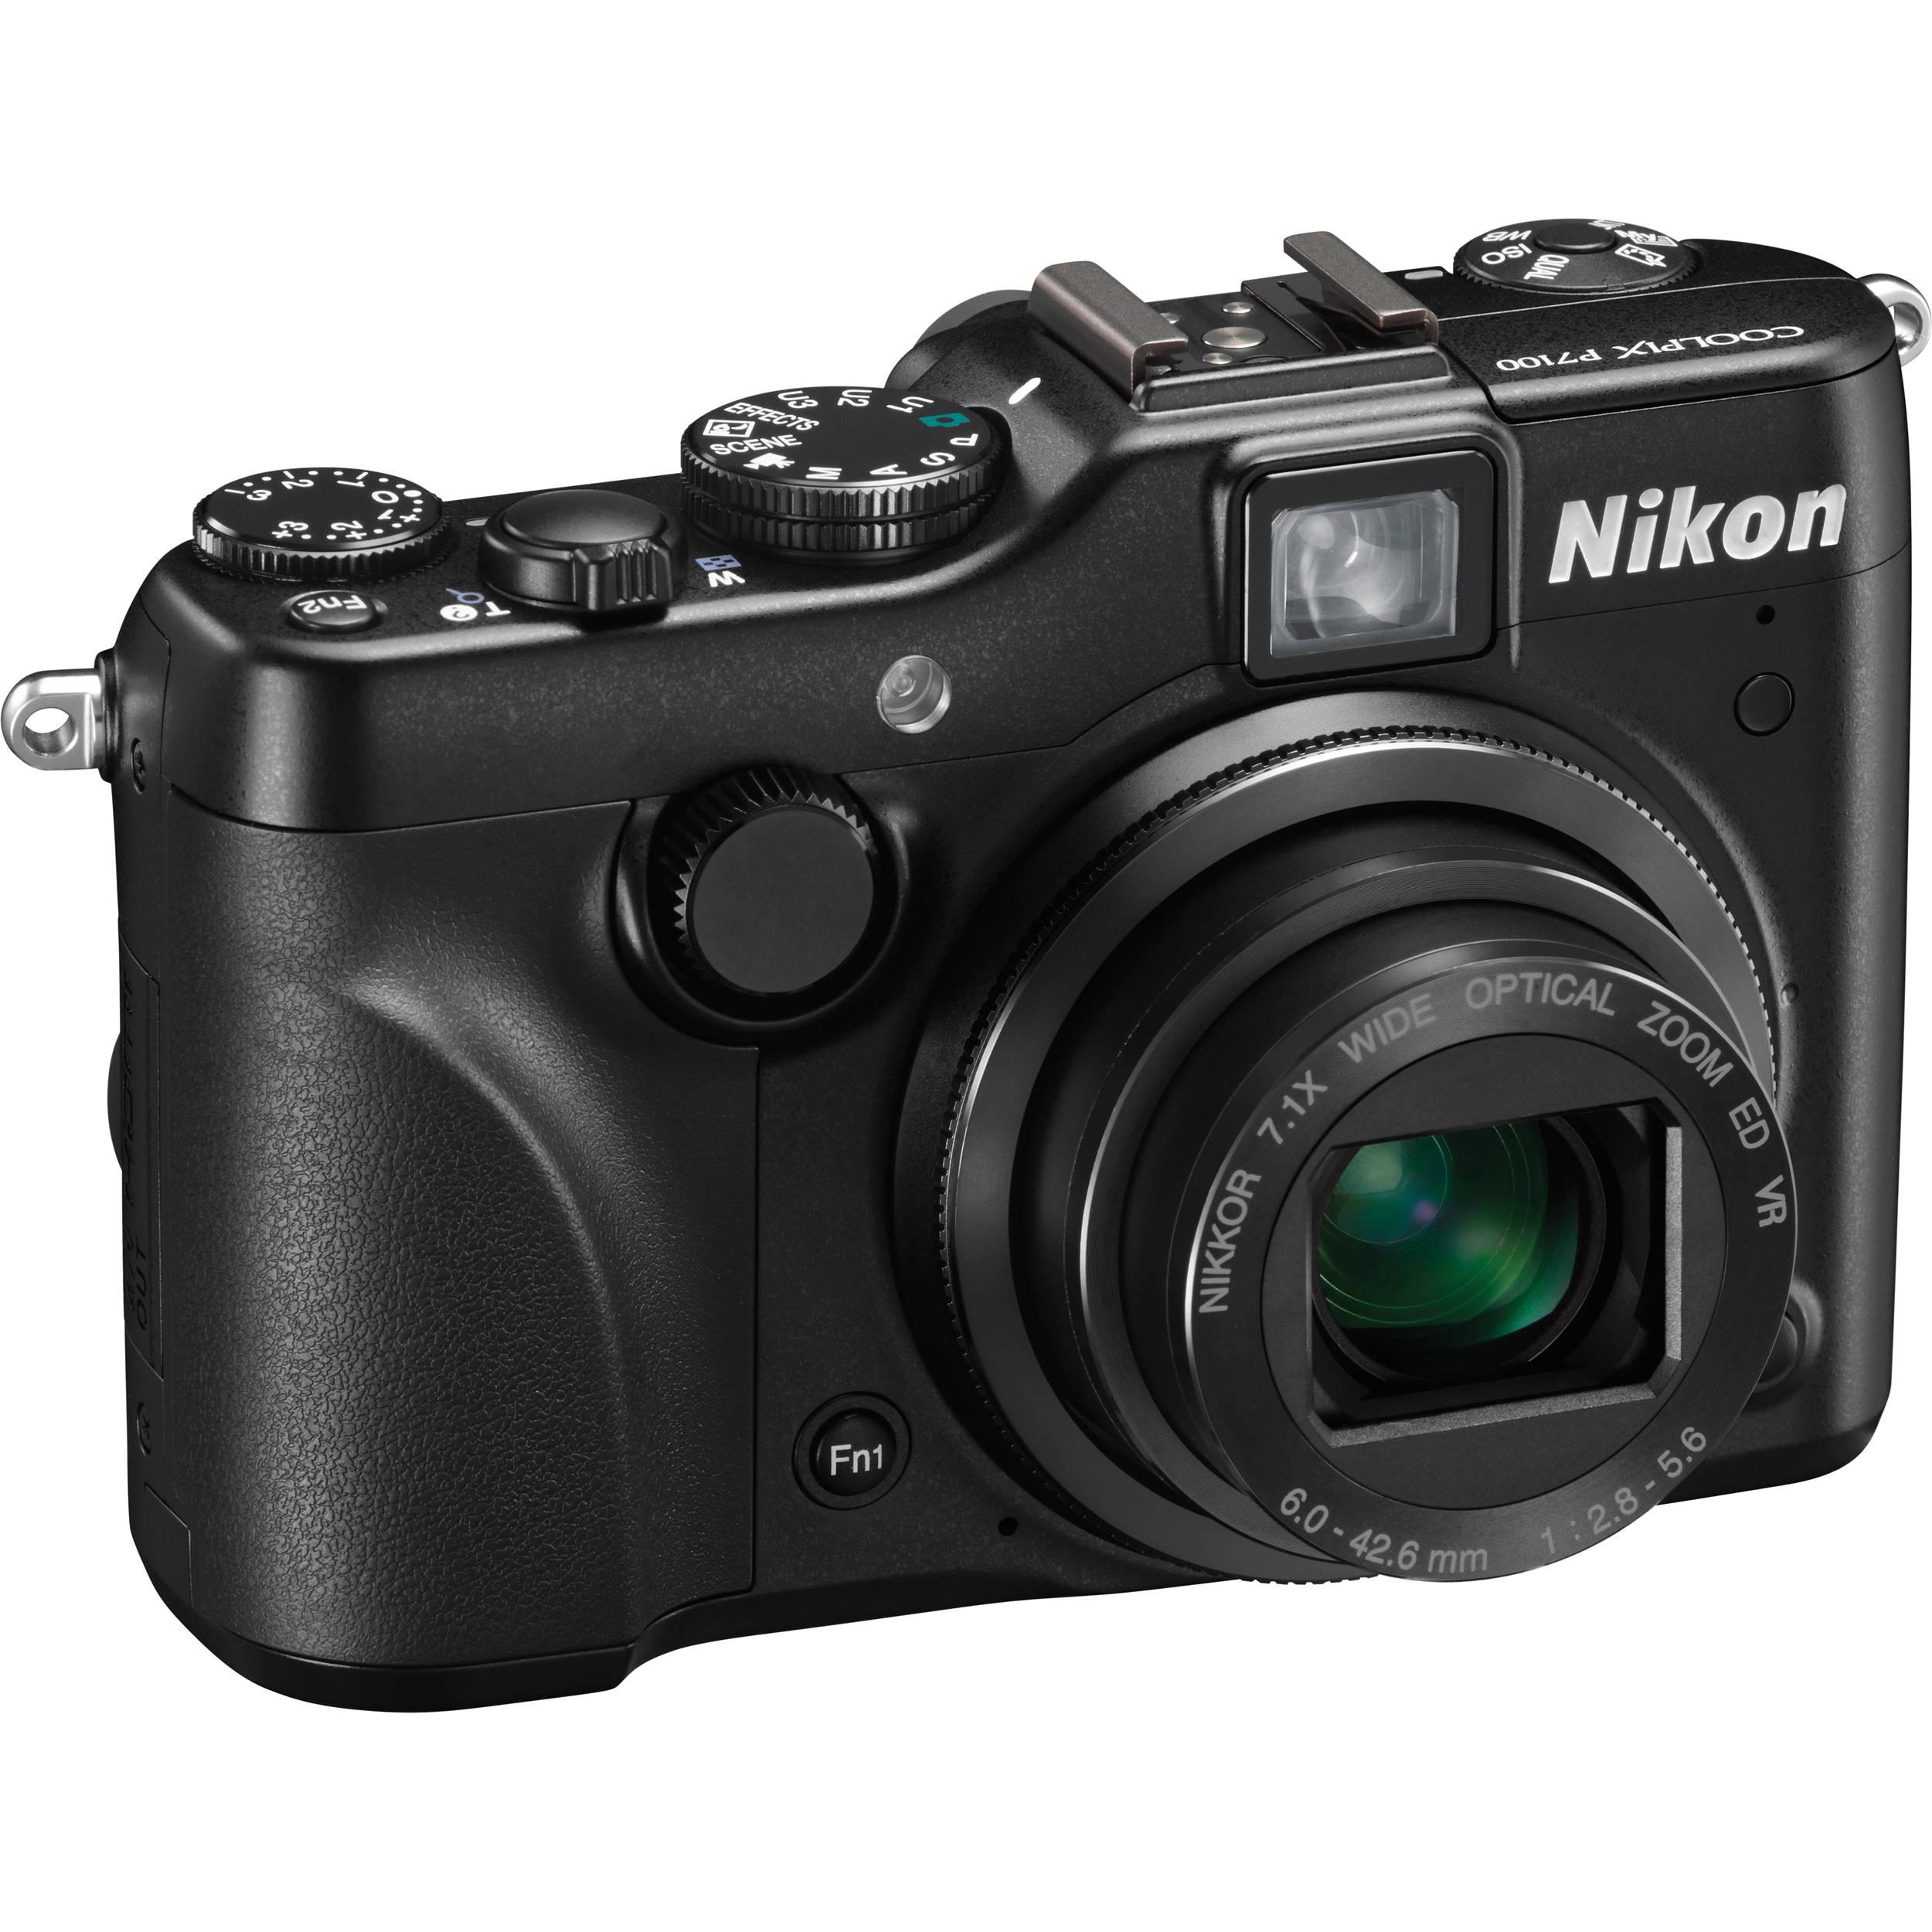 Nikon COOLPIX P7100 Digital Camera 26286 B&H Photo Video